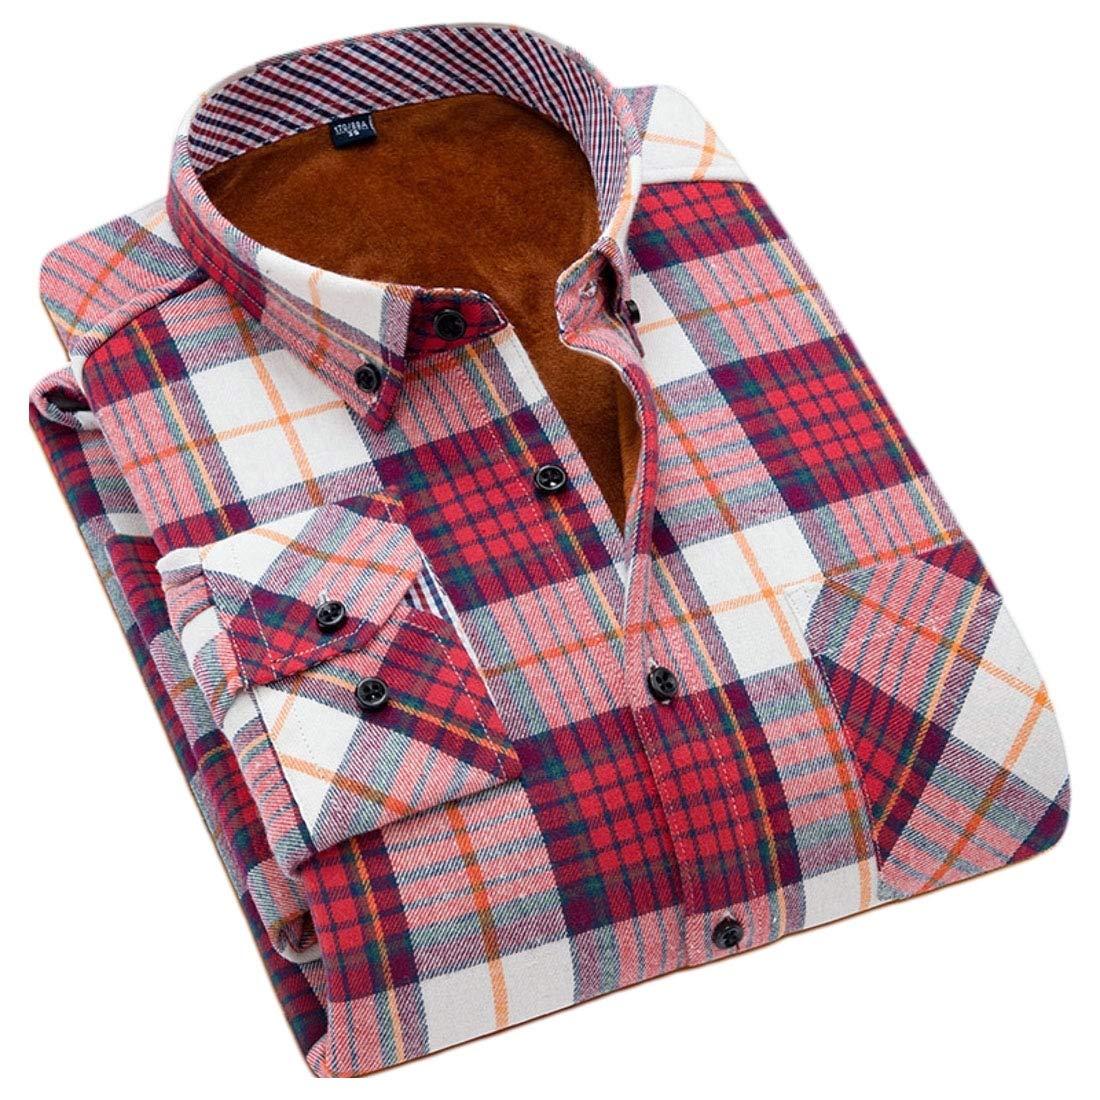 YYG Men Fleece Long Sleeve Button Down Thicker Thermal Dress Checkered Shirt